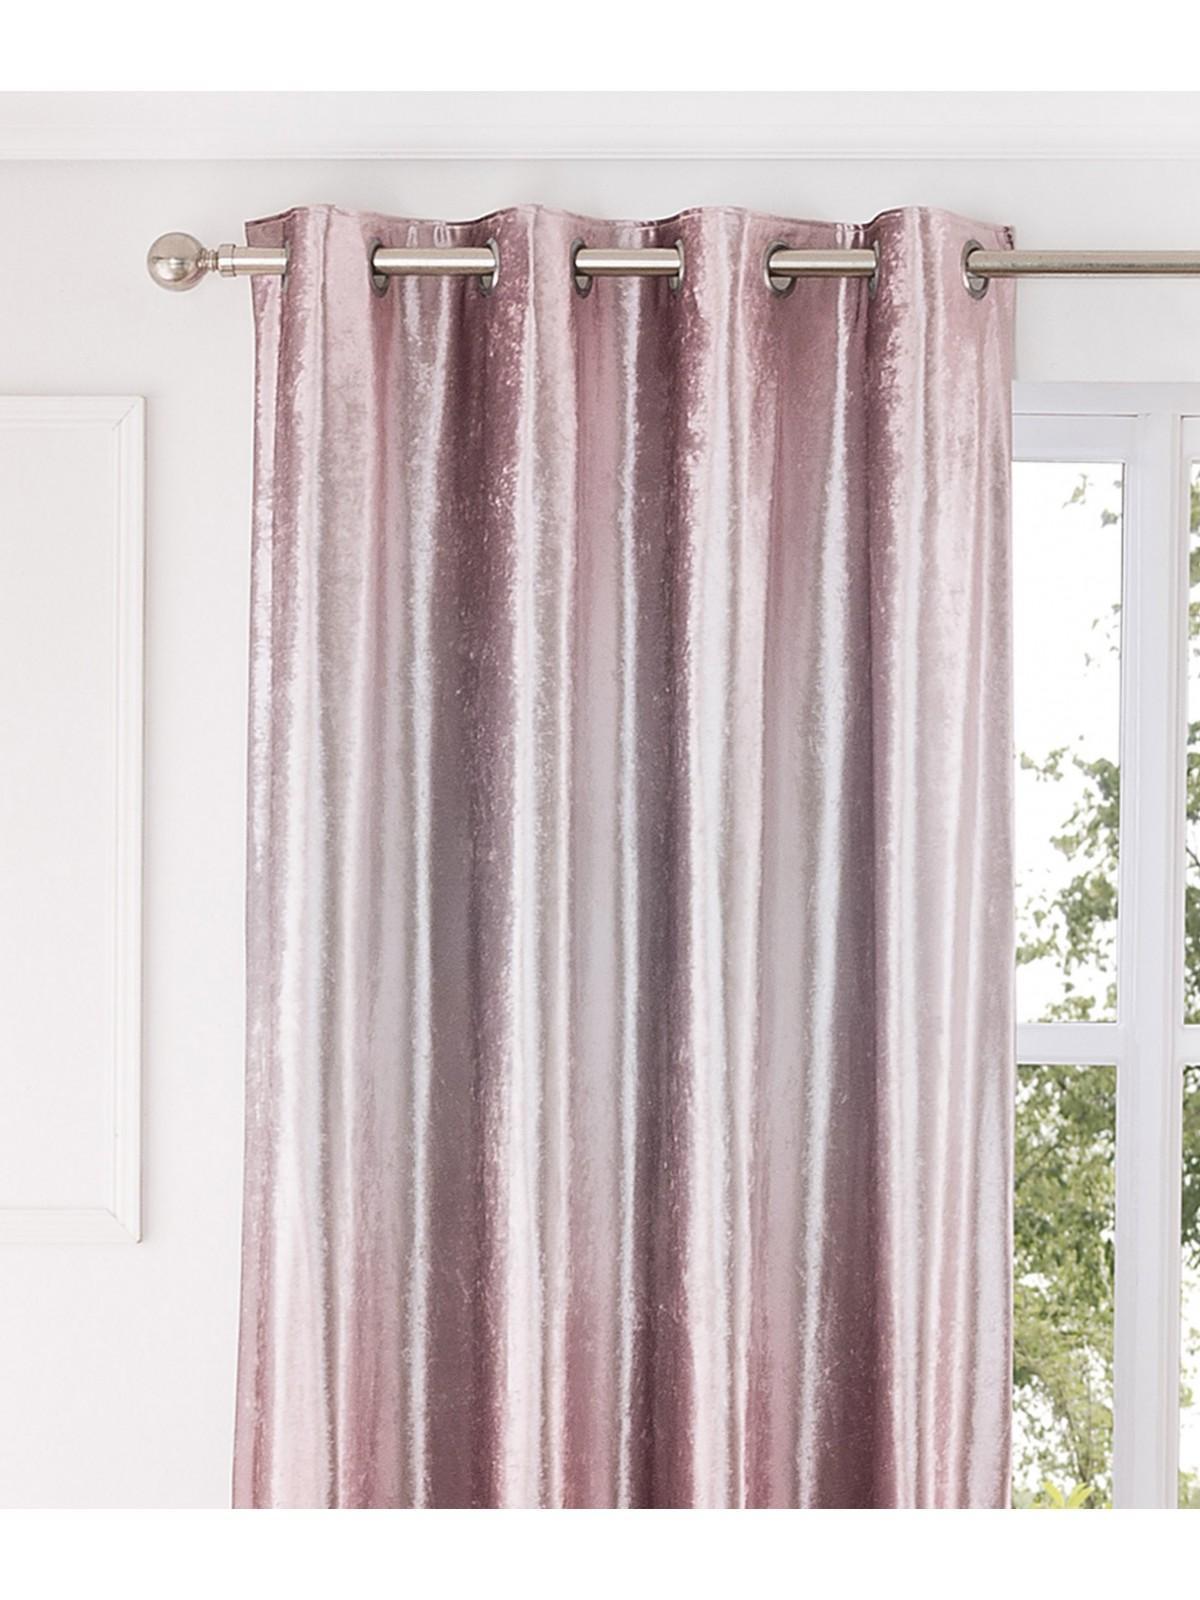 Ombre Crushed Velvet Eyelet Curtains Pink Ponden Home